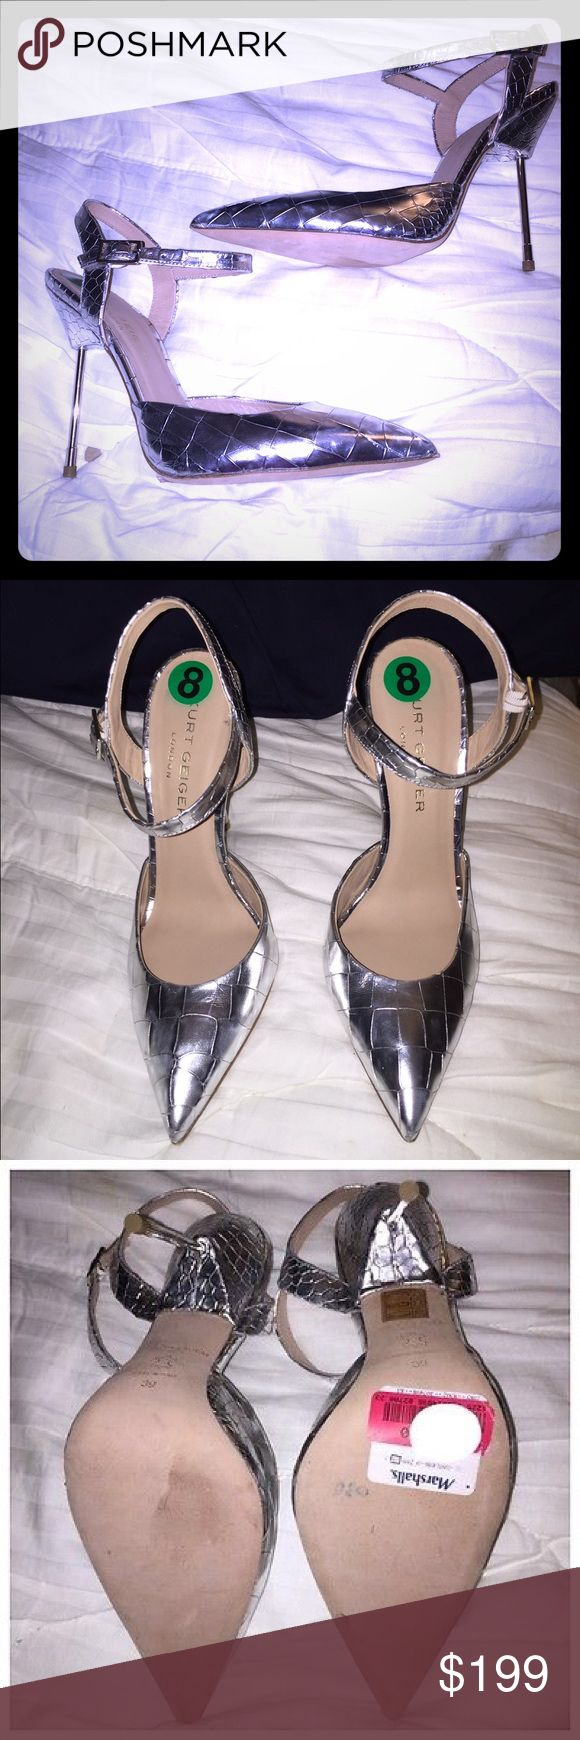 Selling this NWT Kurt Geiger Yasmin Silver Heels on Poshmark! My username is: dionysia8. #shopmycloset #poshmark #fashion #shopping #style #forsale #Kurt Geiger #Shoes